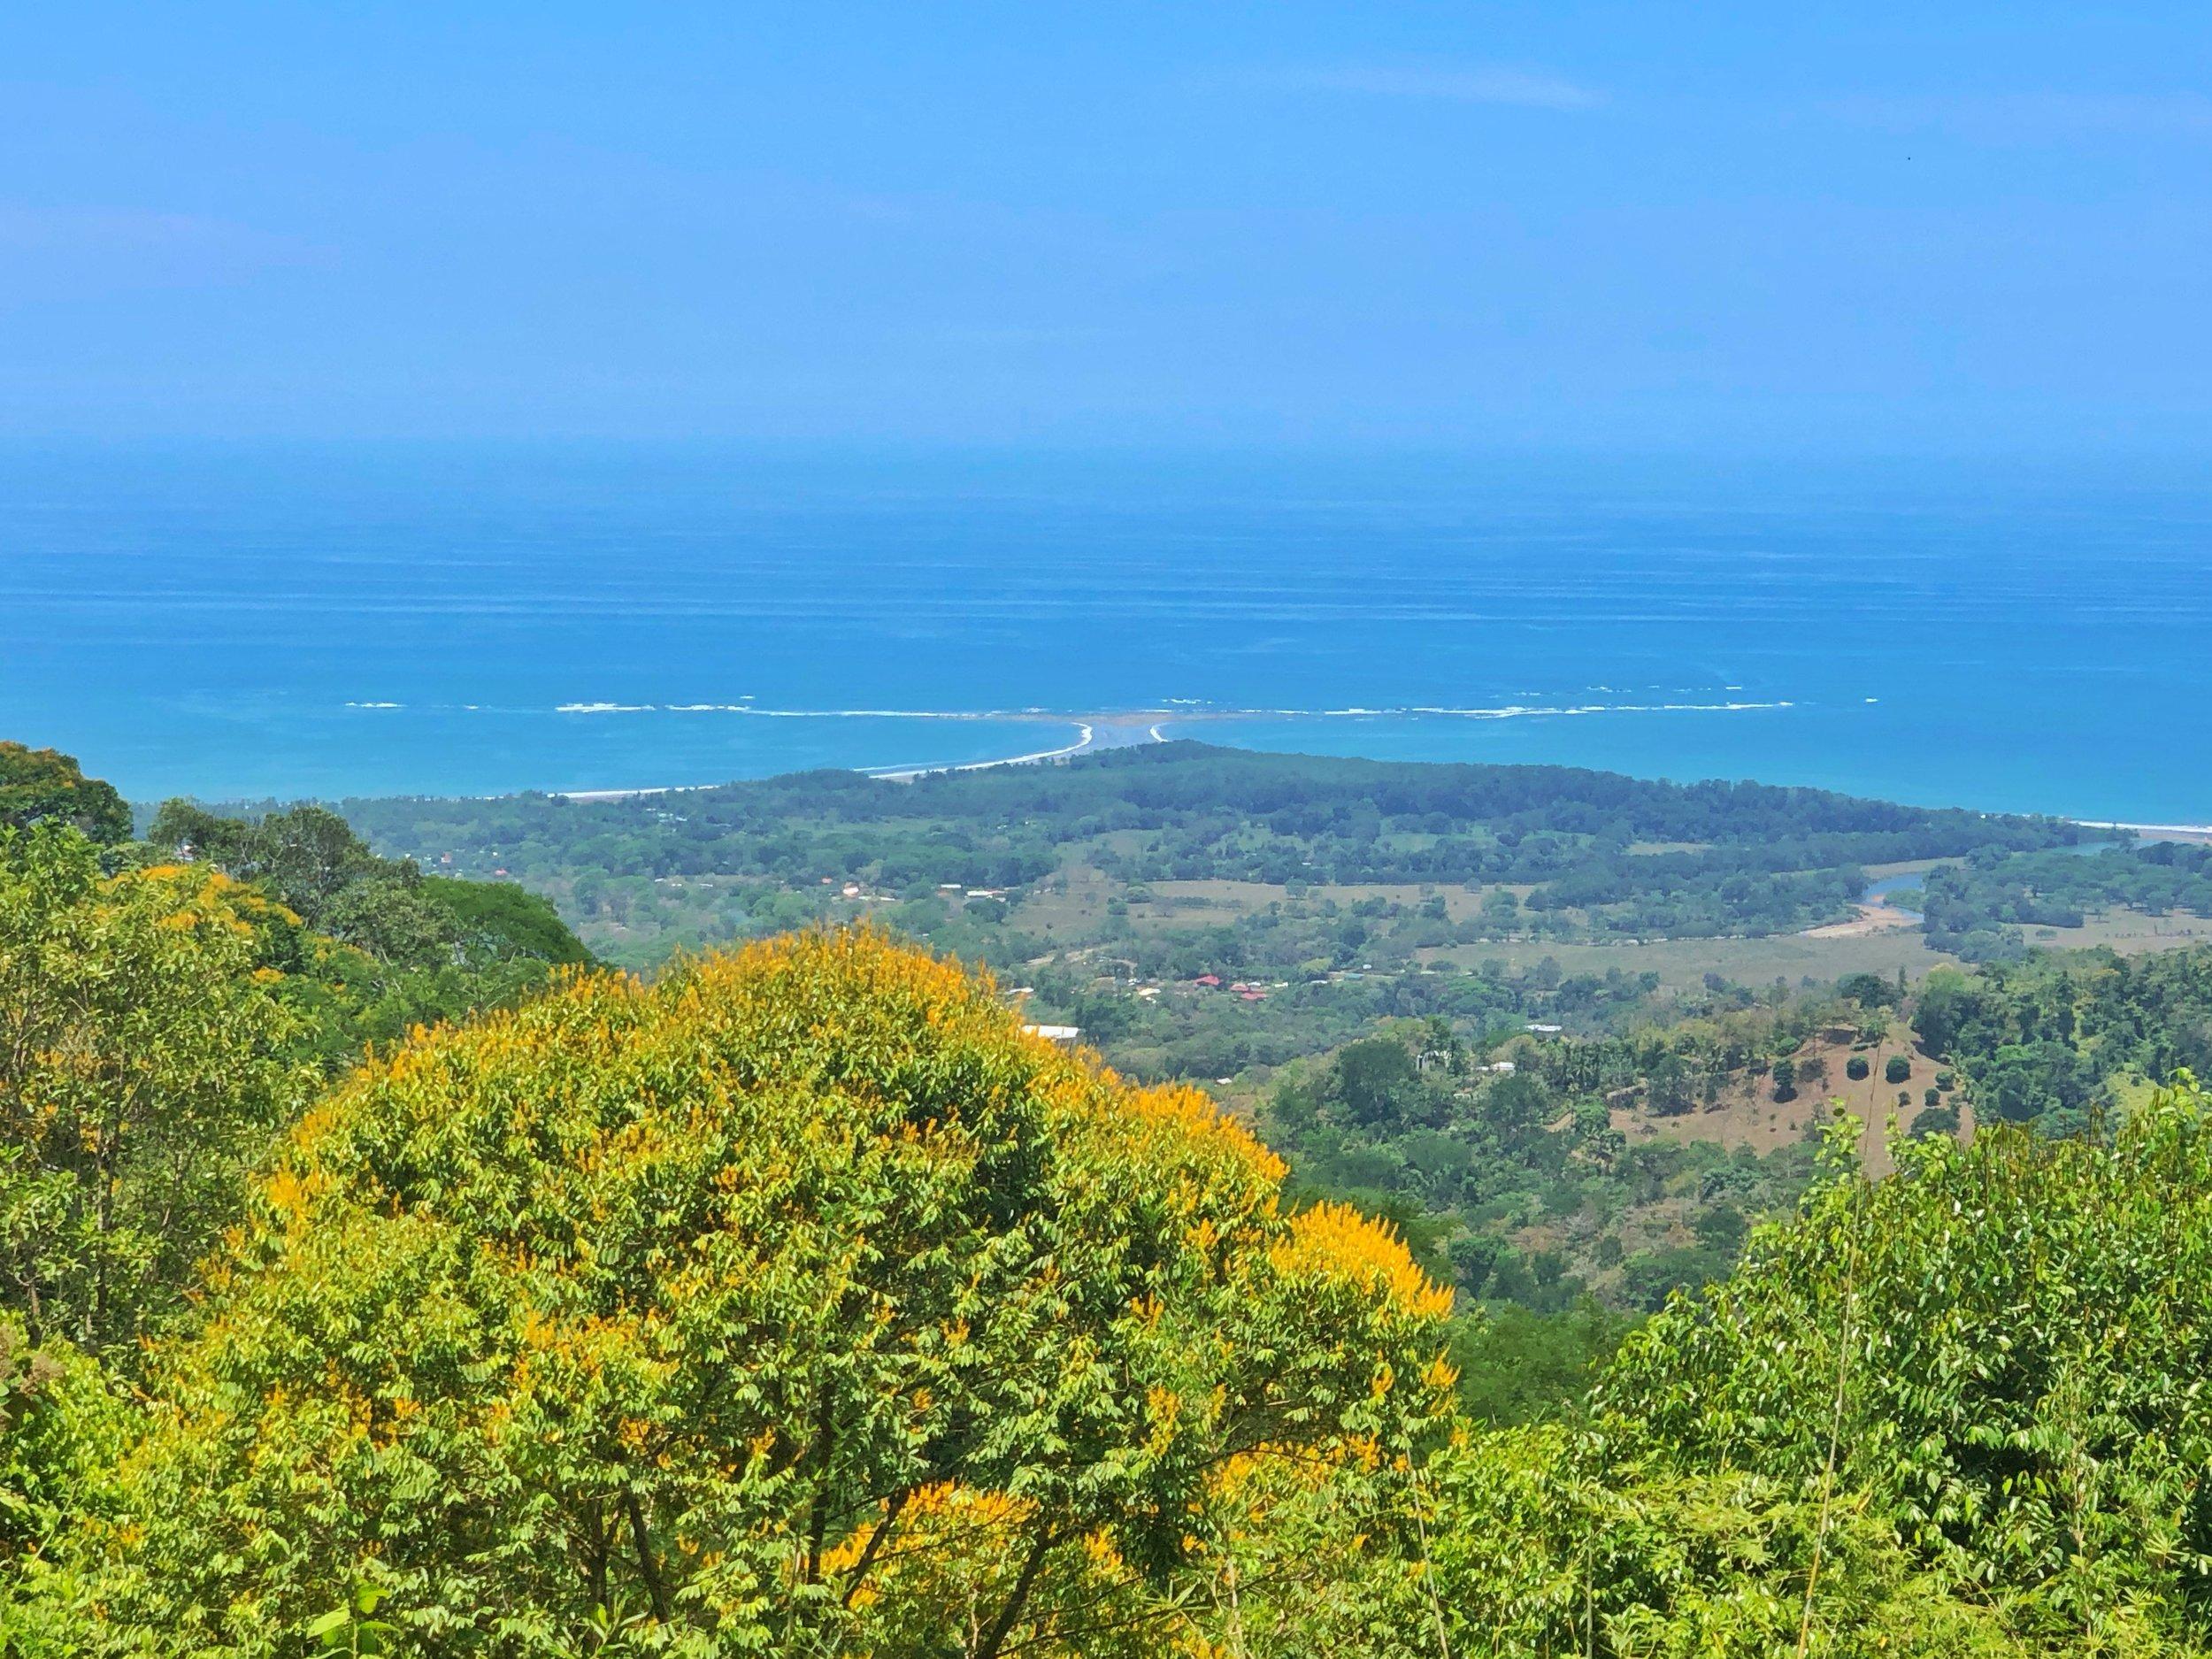 Whales Tail Costa Rica: Vista Celestial